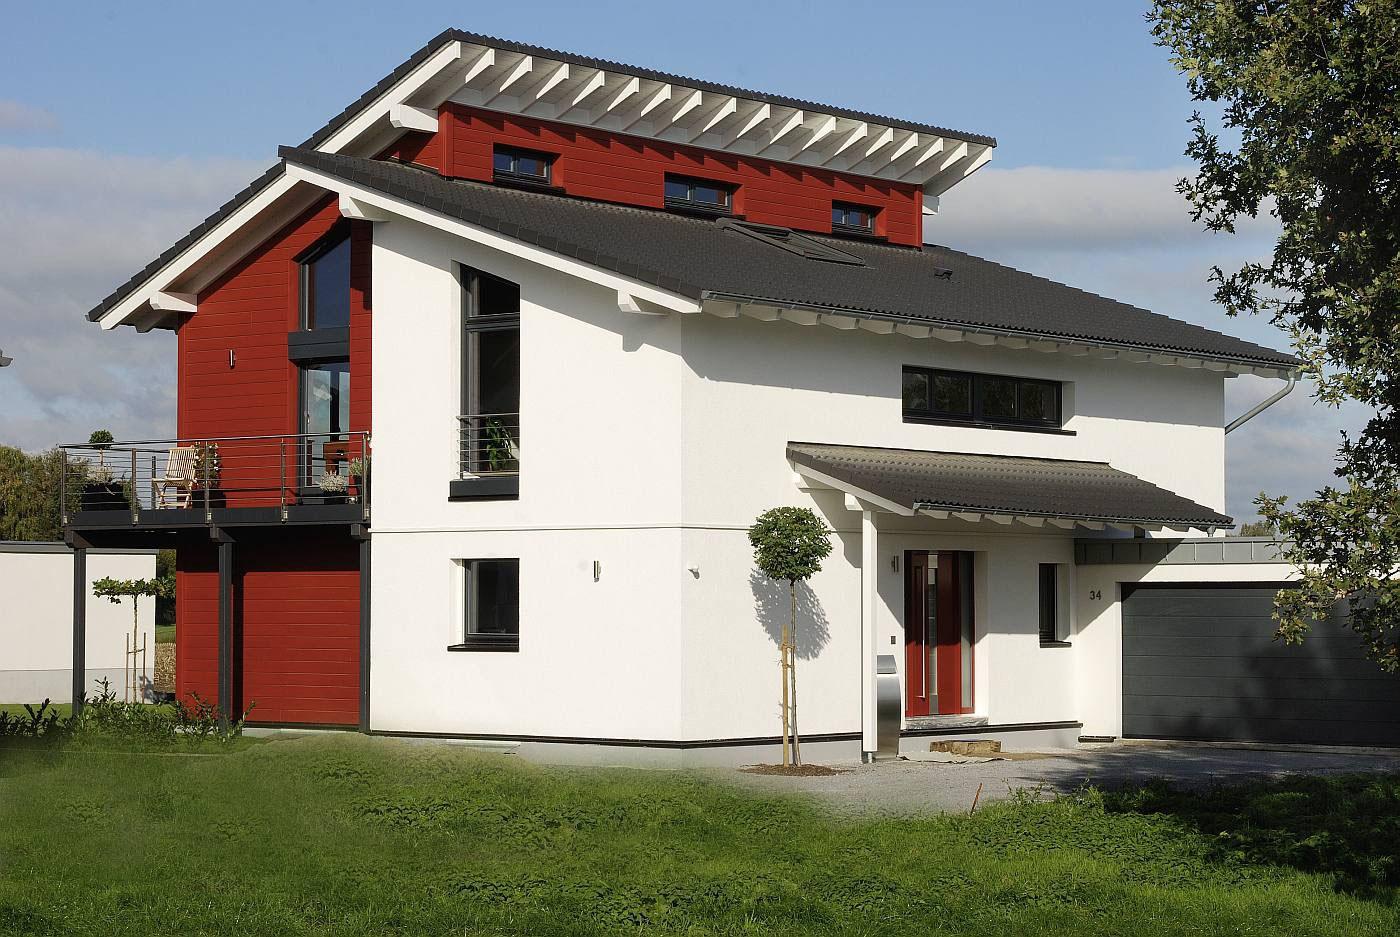 Stommel Haus terrific contemporary german houses images simple design home